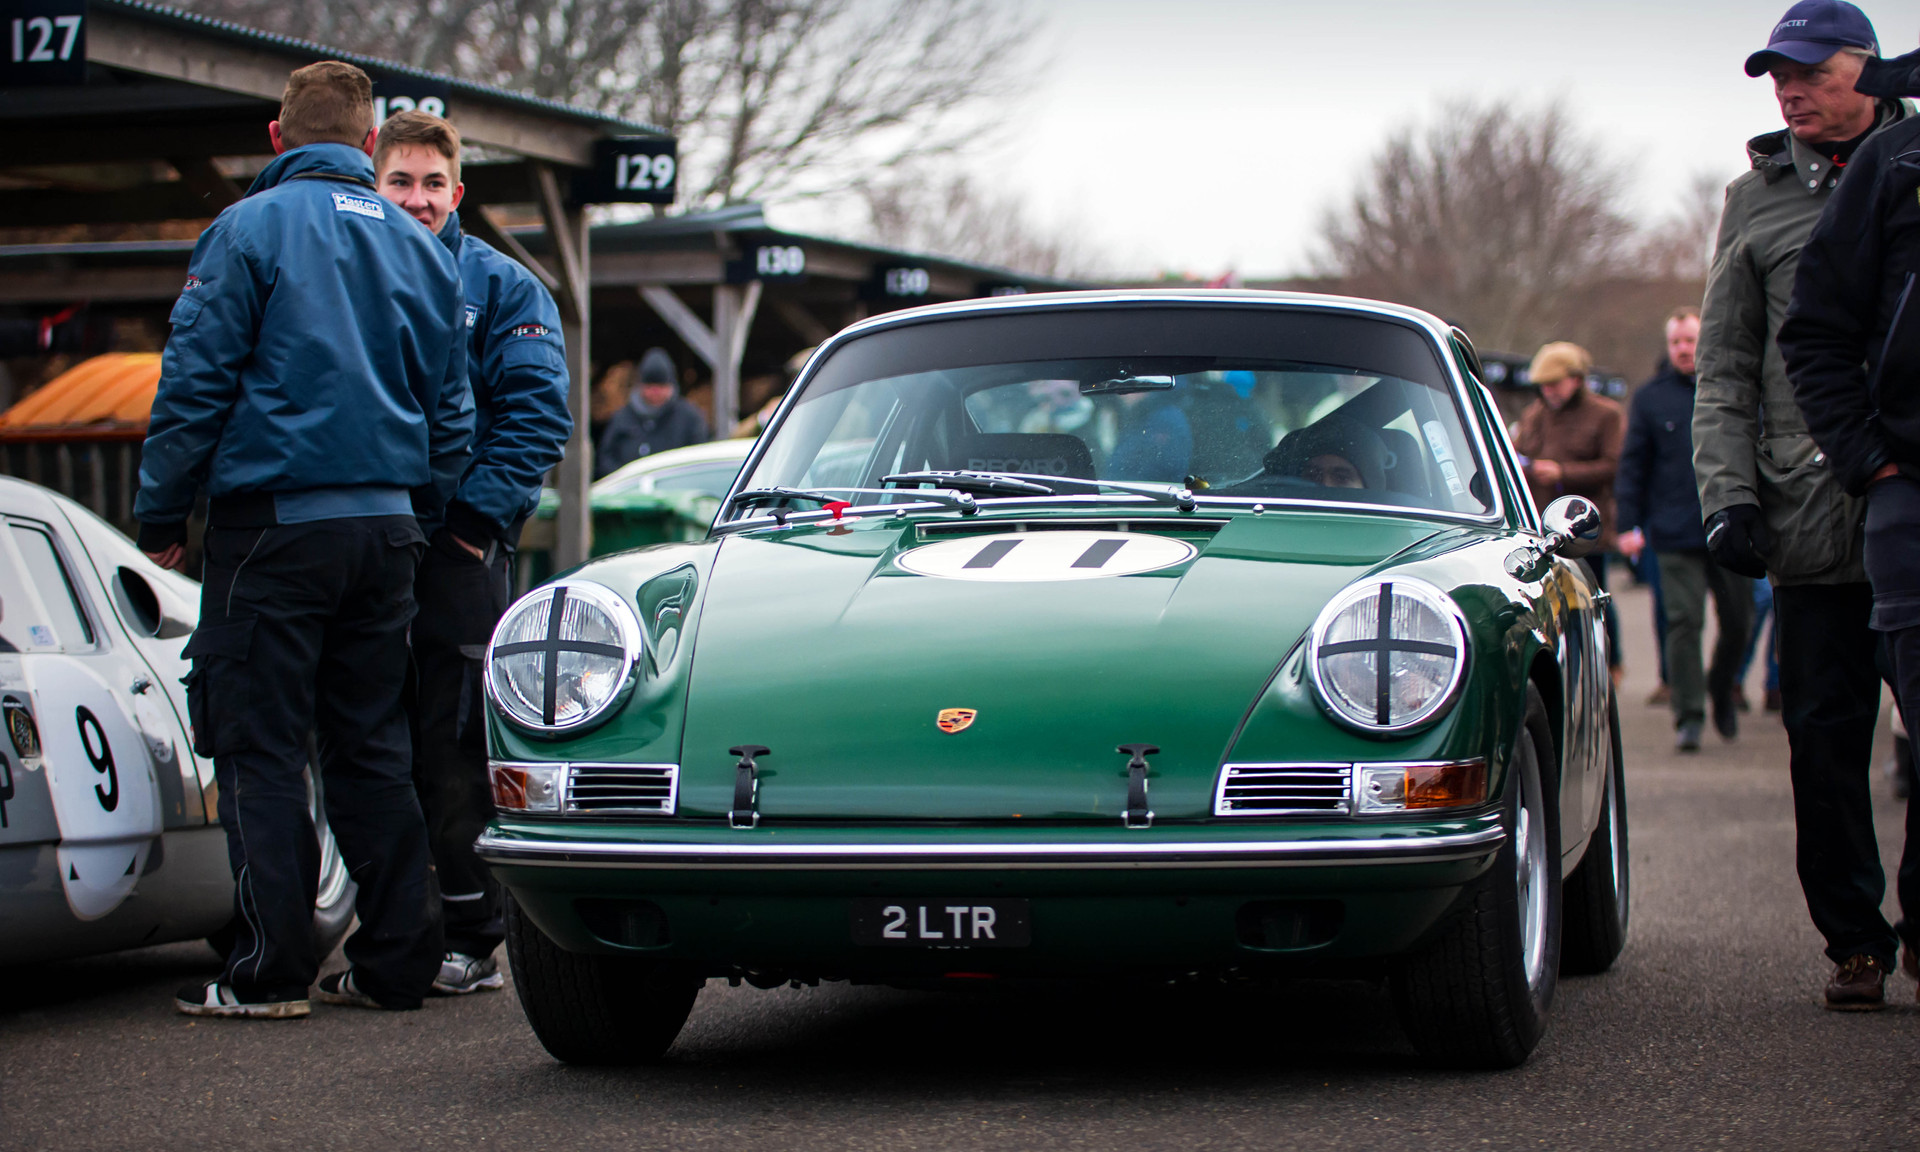 Ian Dalglish's 1965 Porsche 911 at the Goodwood 76MM